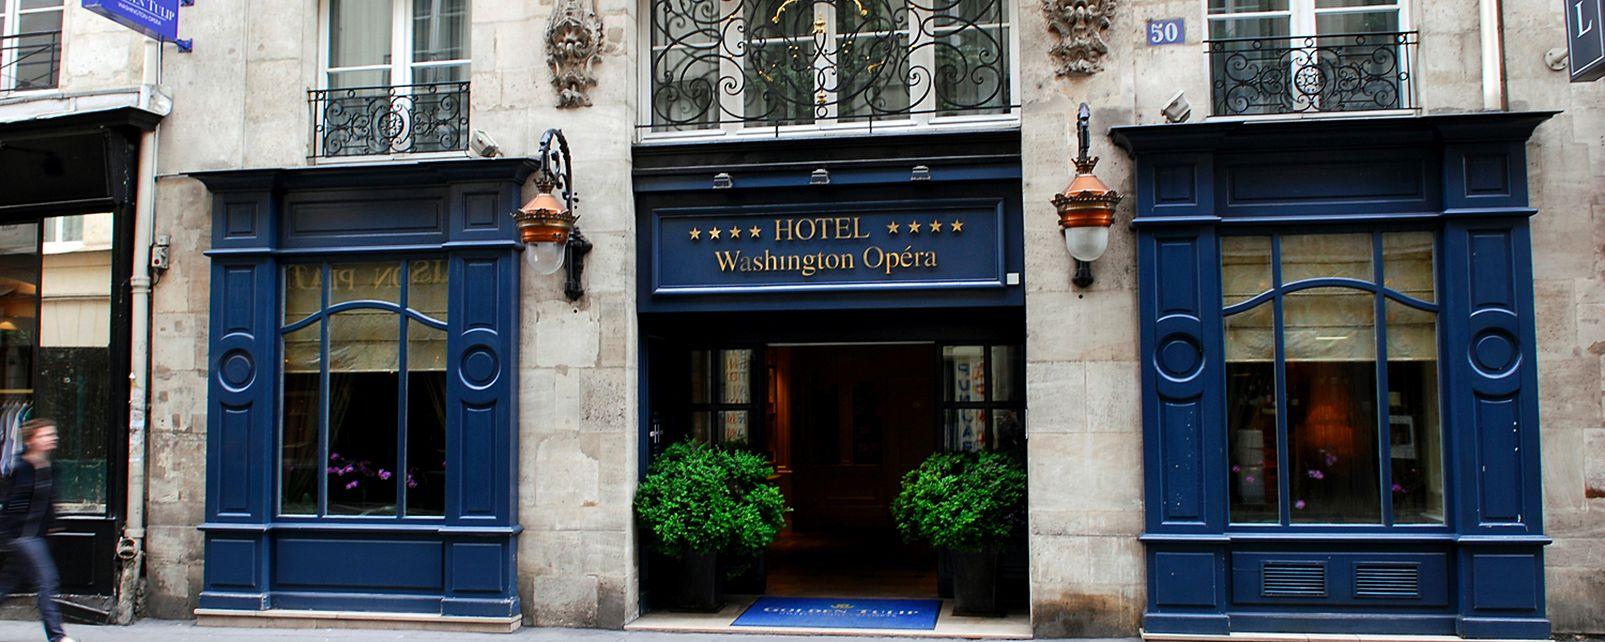 Hotel Washington Opéra